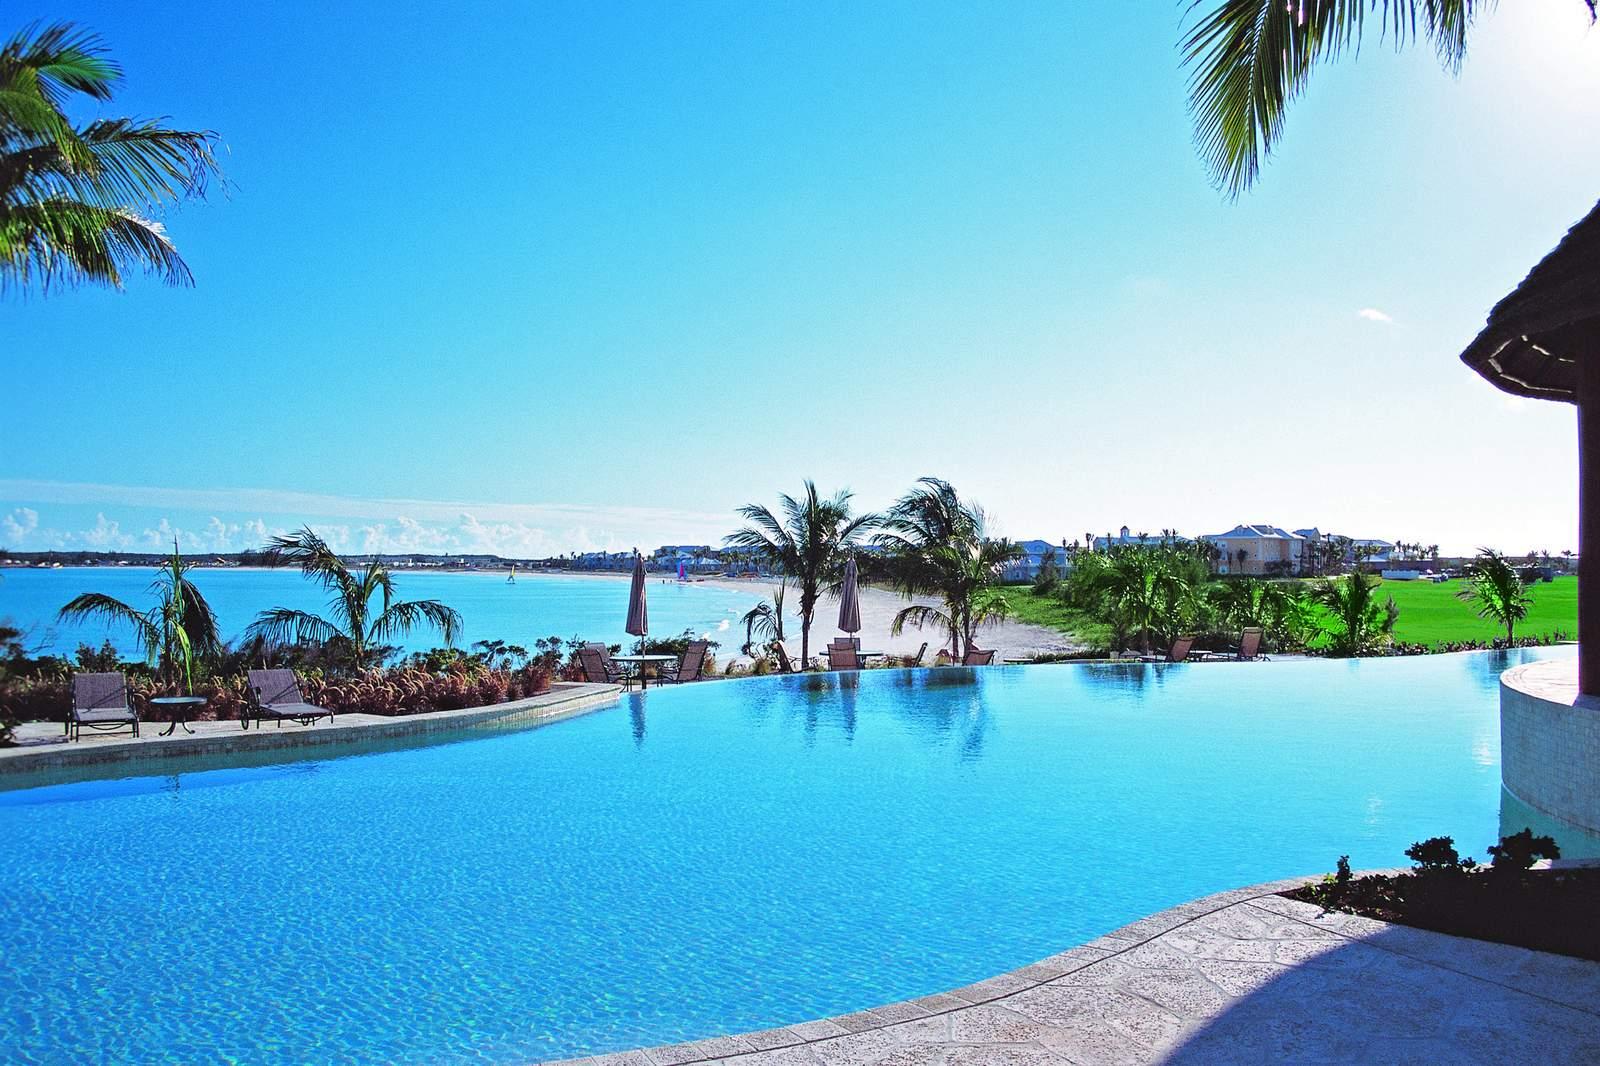 Impression Sandals Emerald Bay Resort